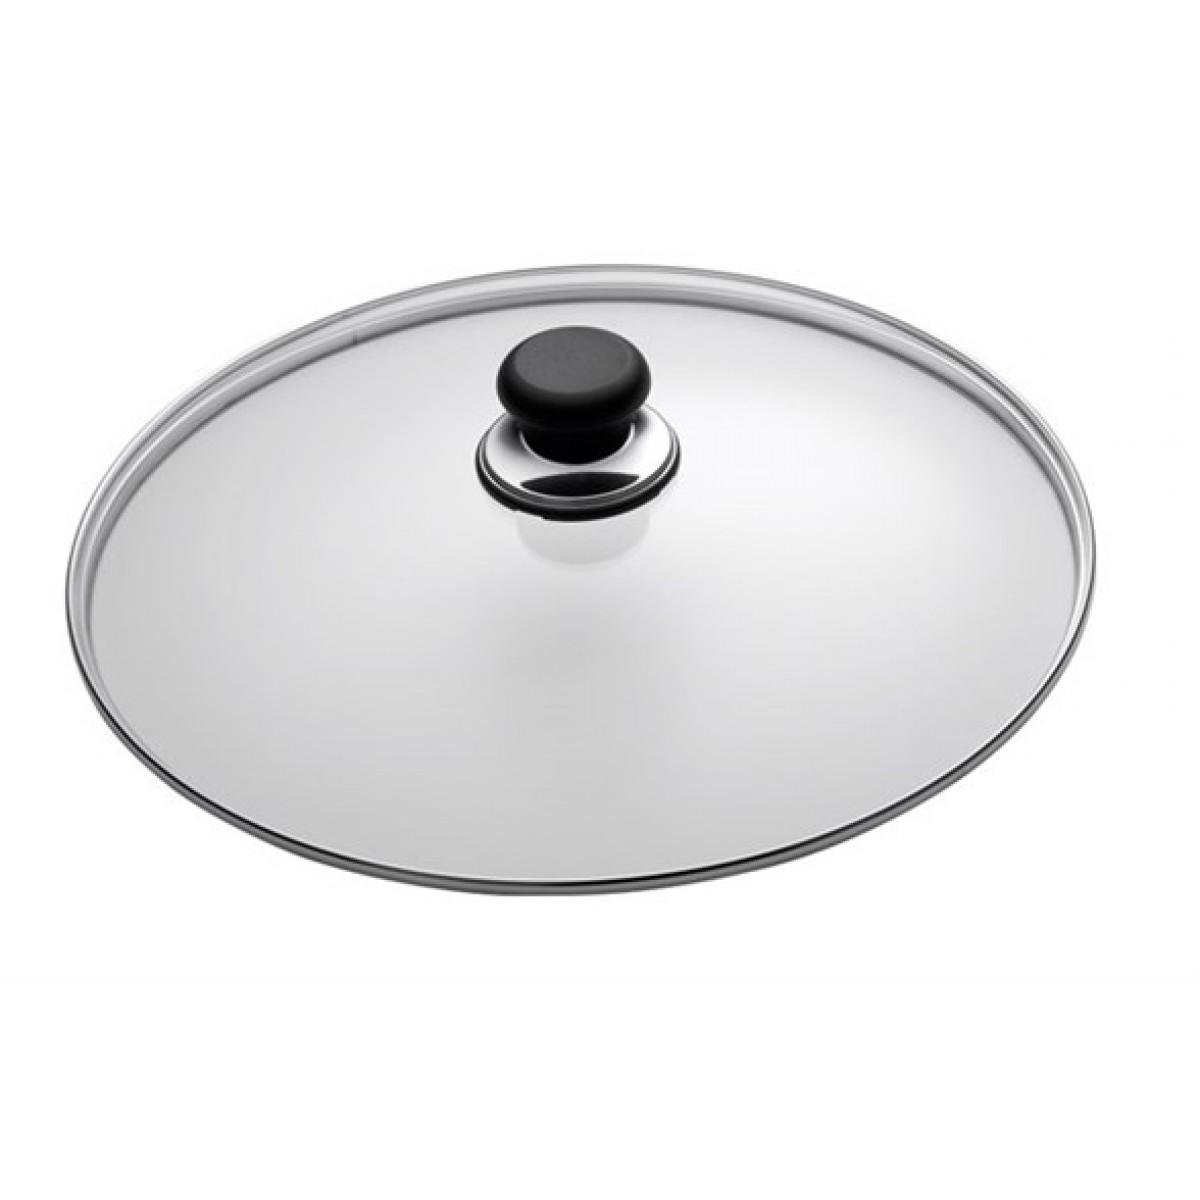 SCANPAN Glaslåg 16 cm classic